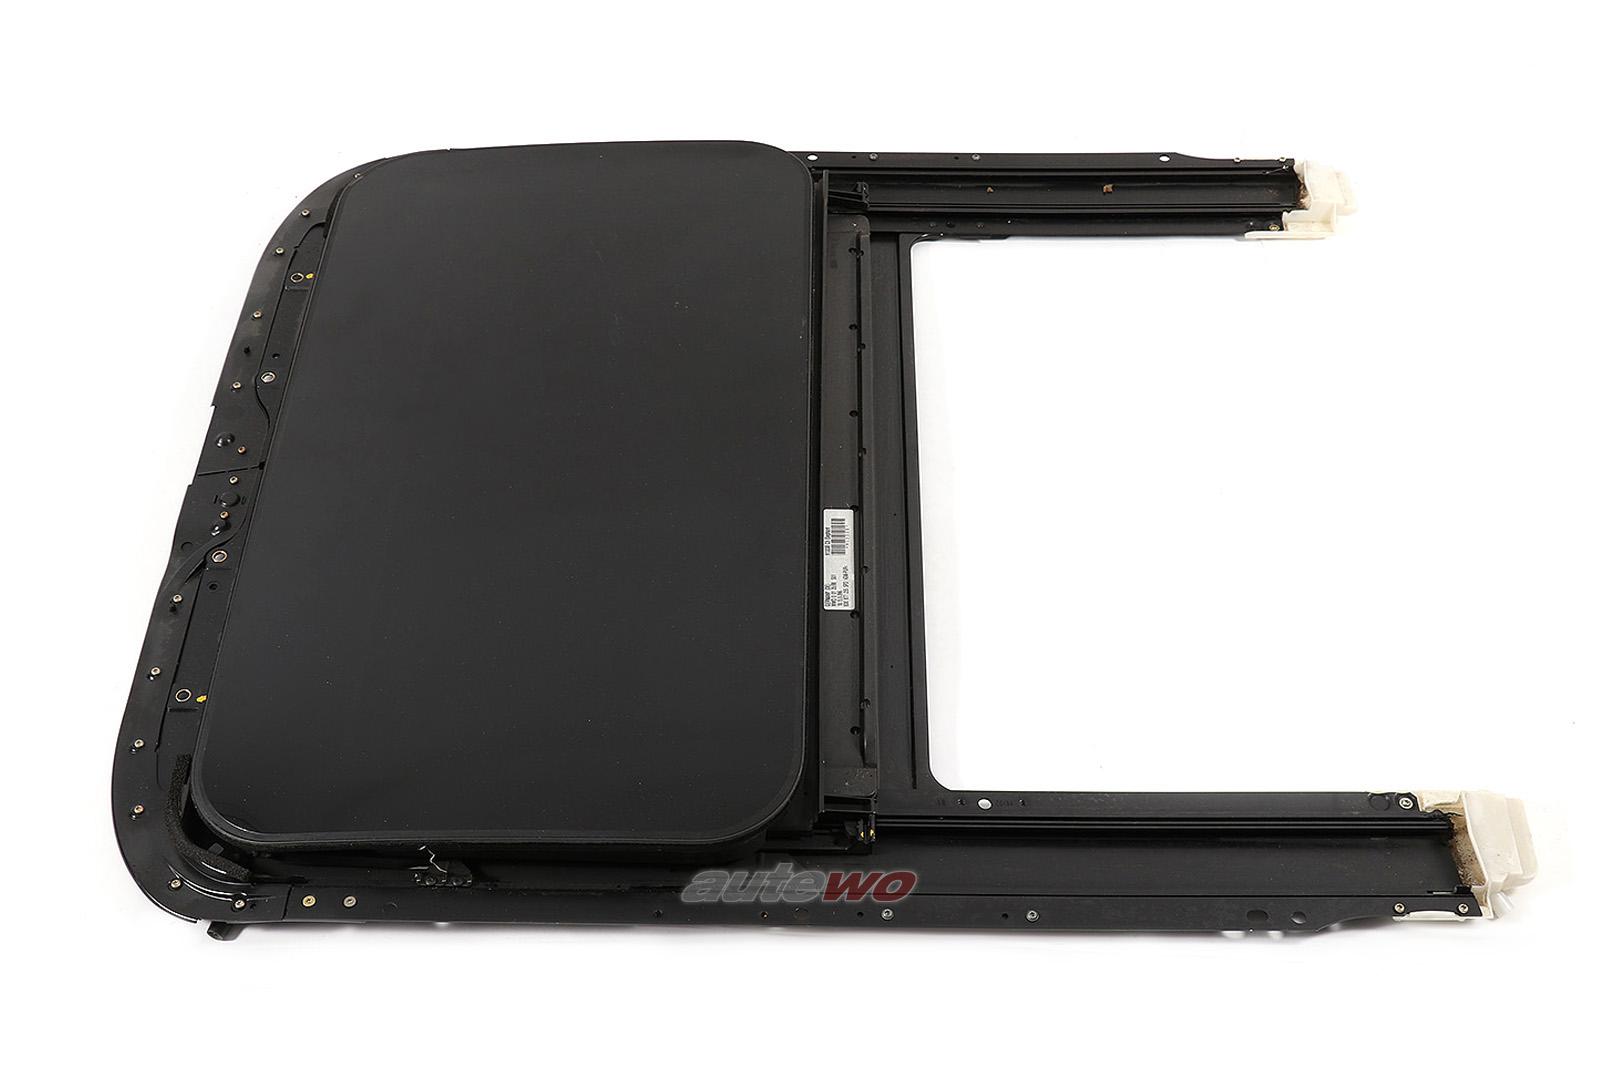 4B9877049C/4B0877071L Audi A6/S6/RS6/Allroad 4B Avant Glas-Schiebedach